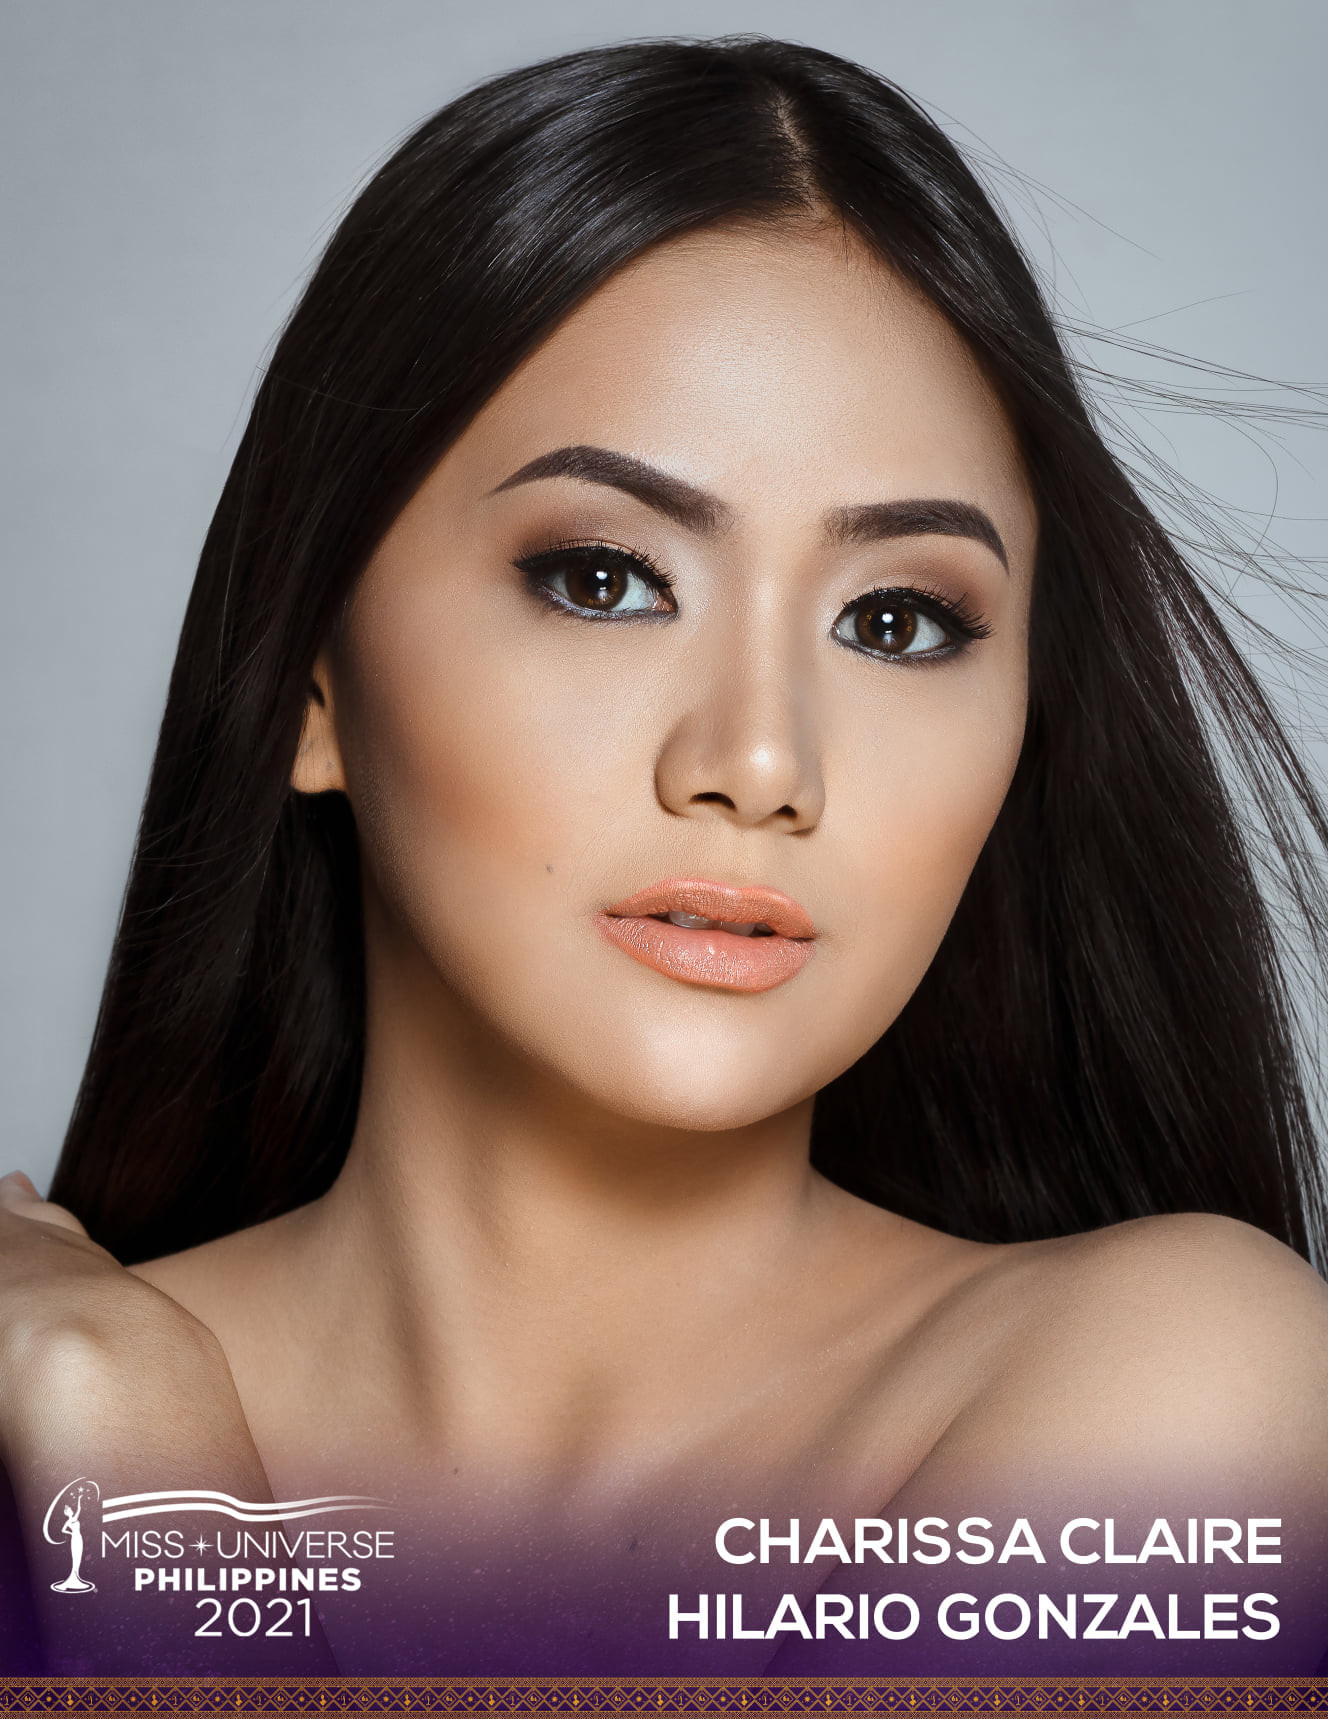 pre-candidatas a miss universe philippines 2021. - Página 3 Alodl4